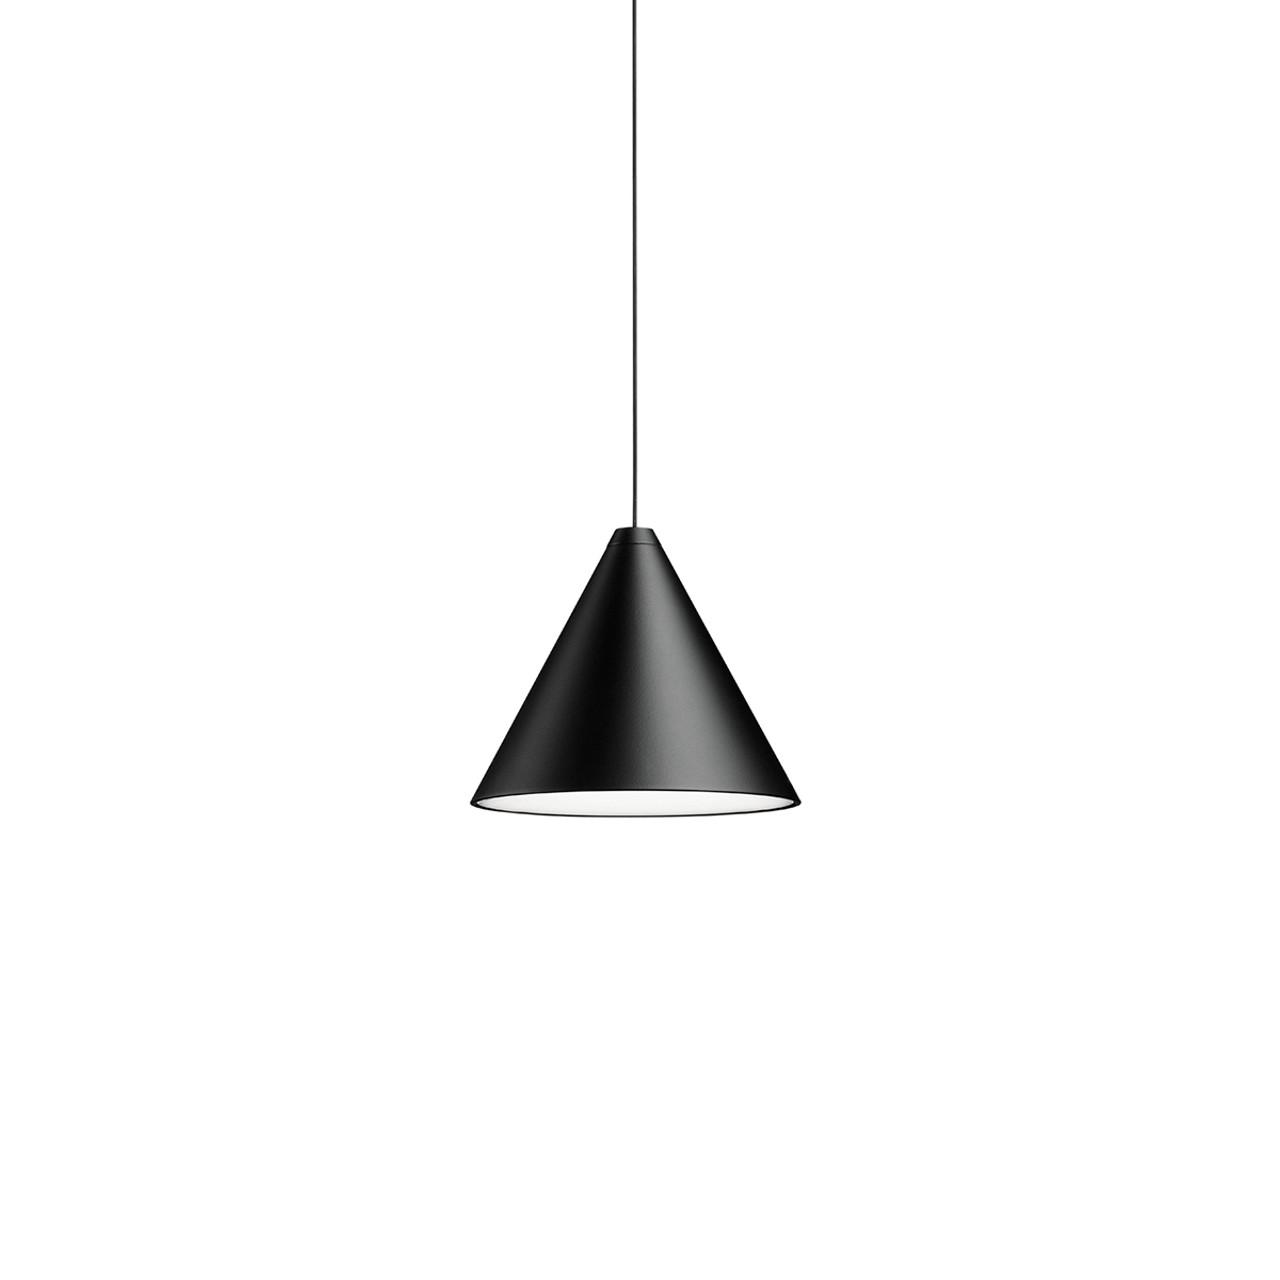 hight resolution of string lights cone michael anastassiades